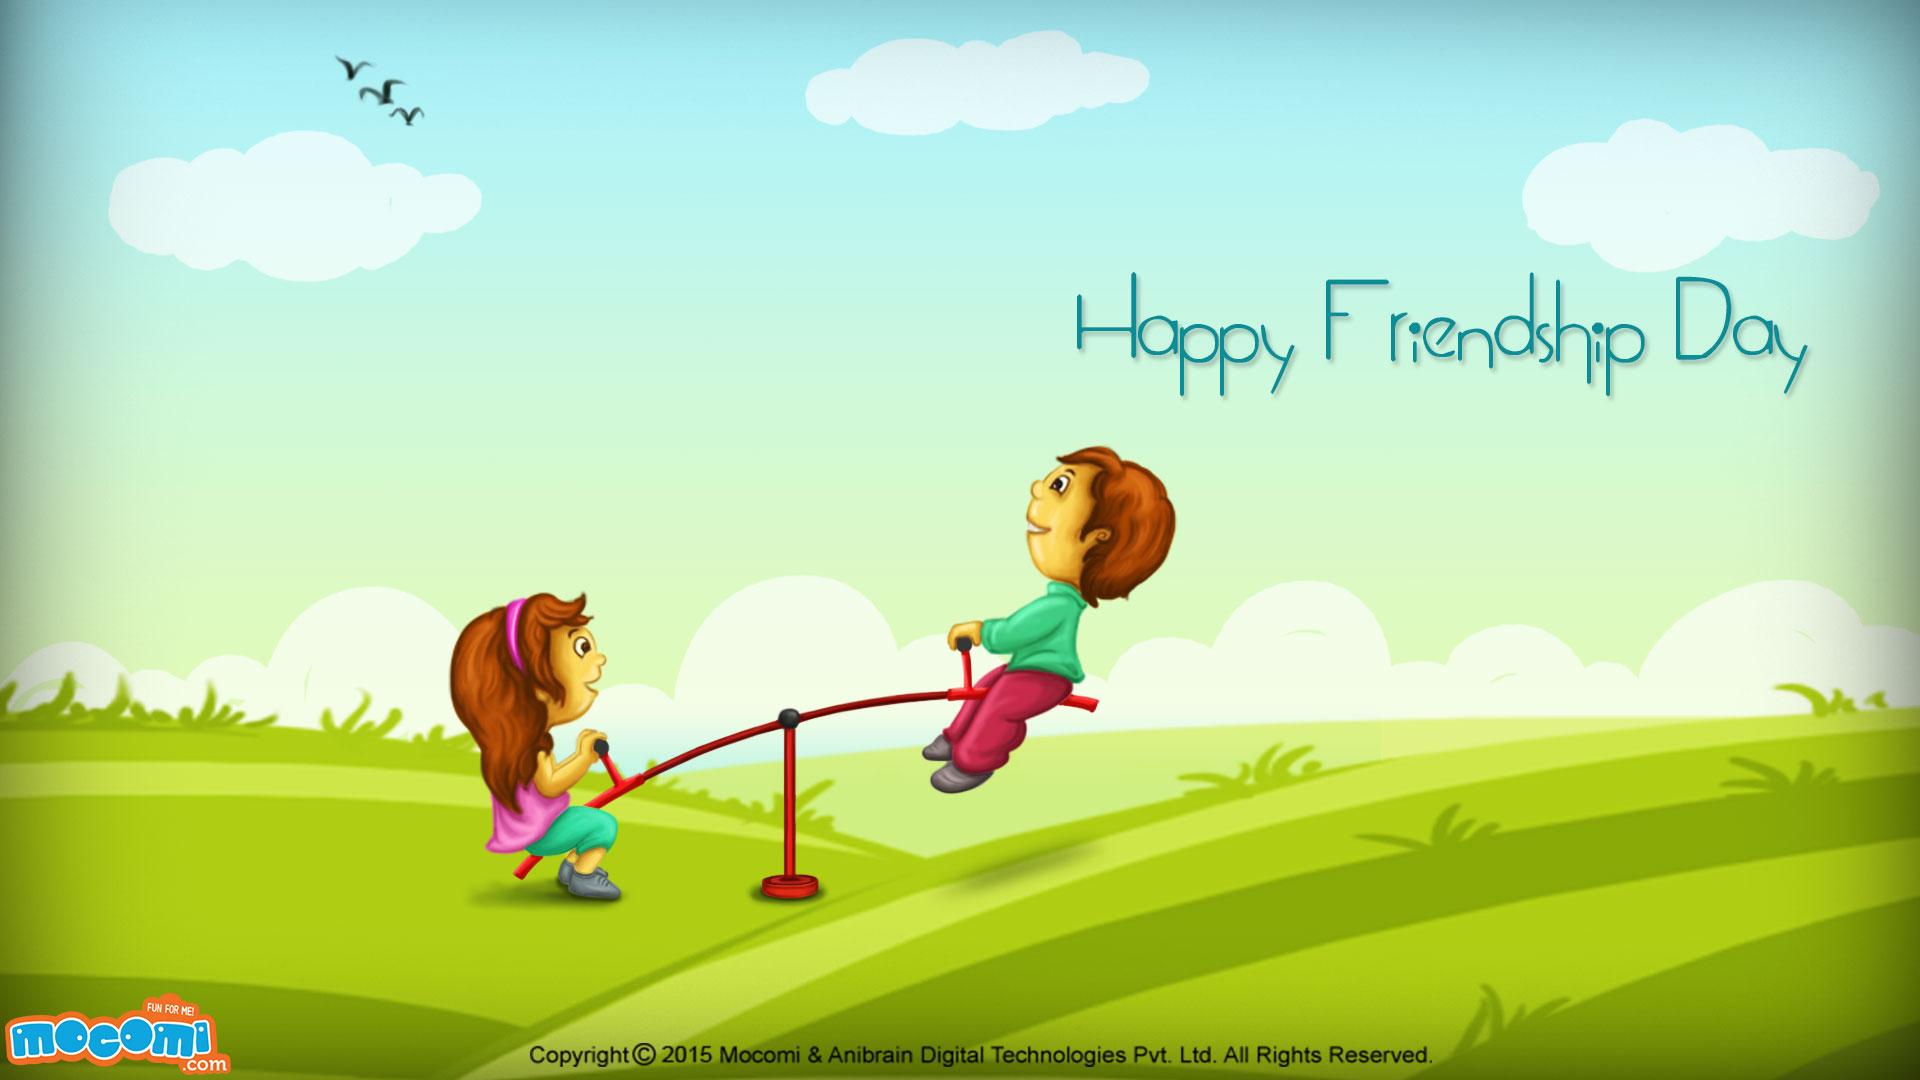 Happy Friendship Day Wallpaper – 03